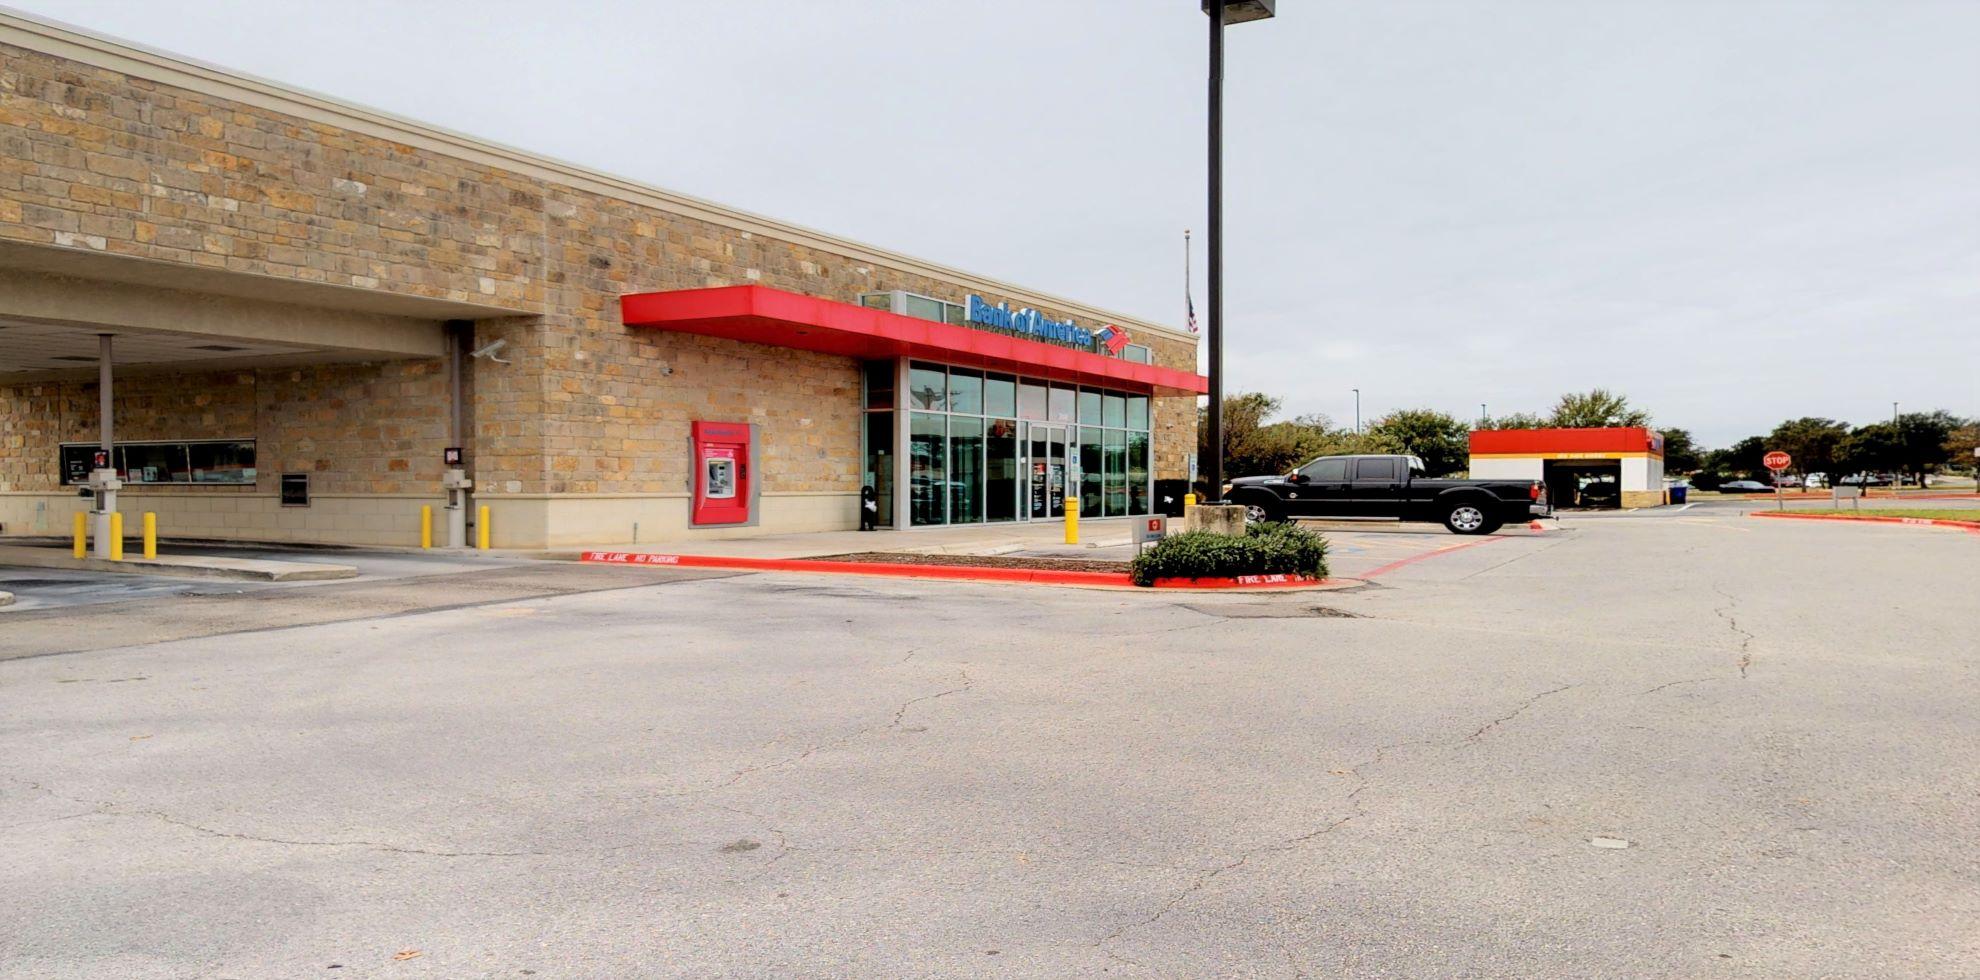 Bank of America financial center with drive-thru ATM and teller | 2800 E Whitestone Blvd, Cedar Park, TX 78613